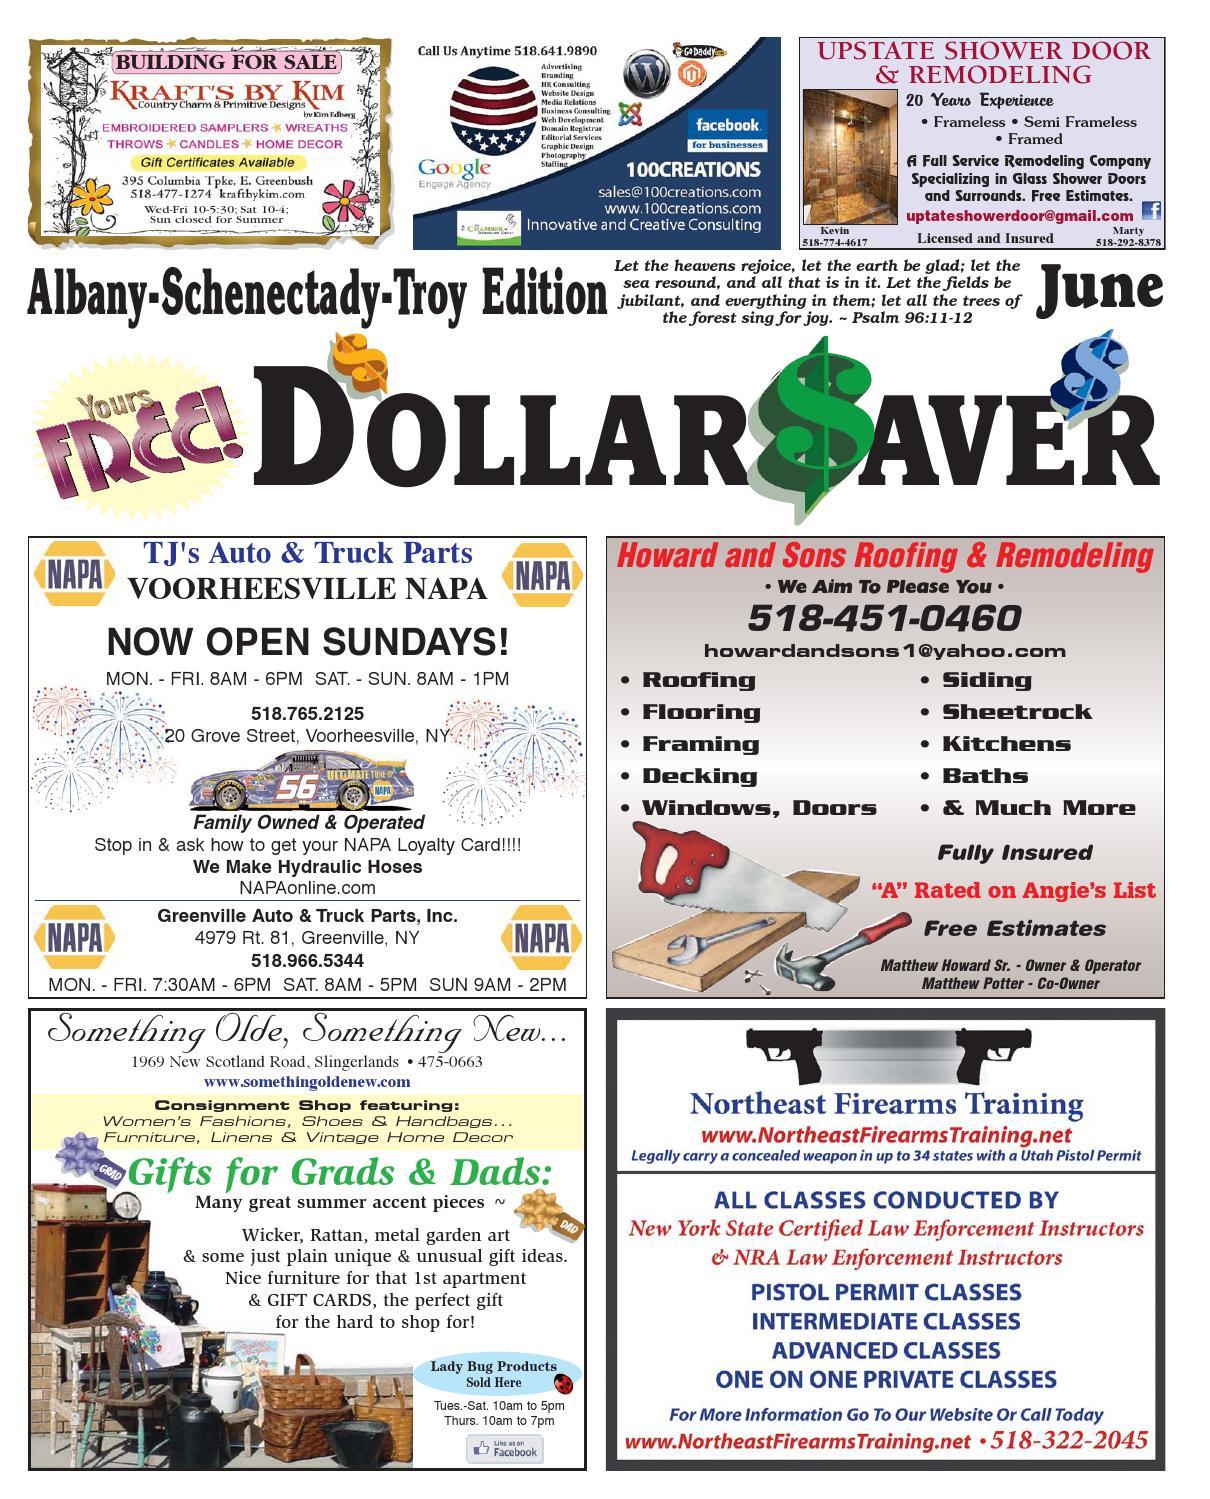 fd0361044f Dollar Saver Albany-Schenectady-Troy 6.13 by John Snyder - issuu